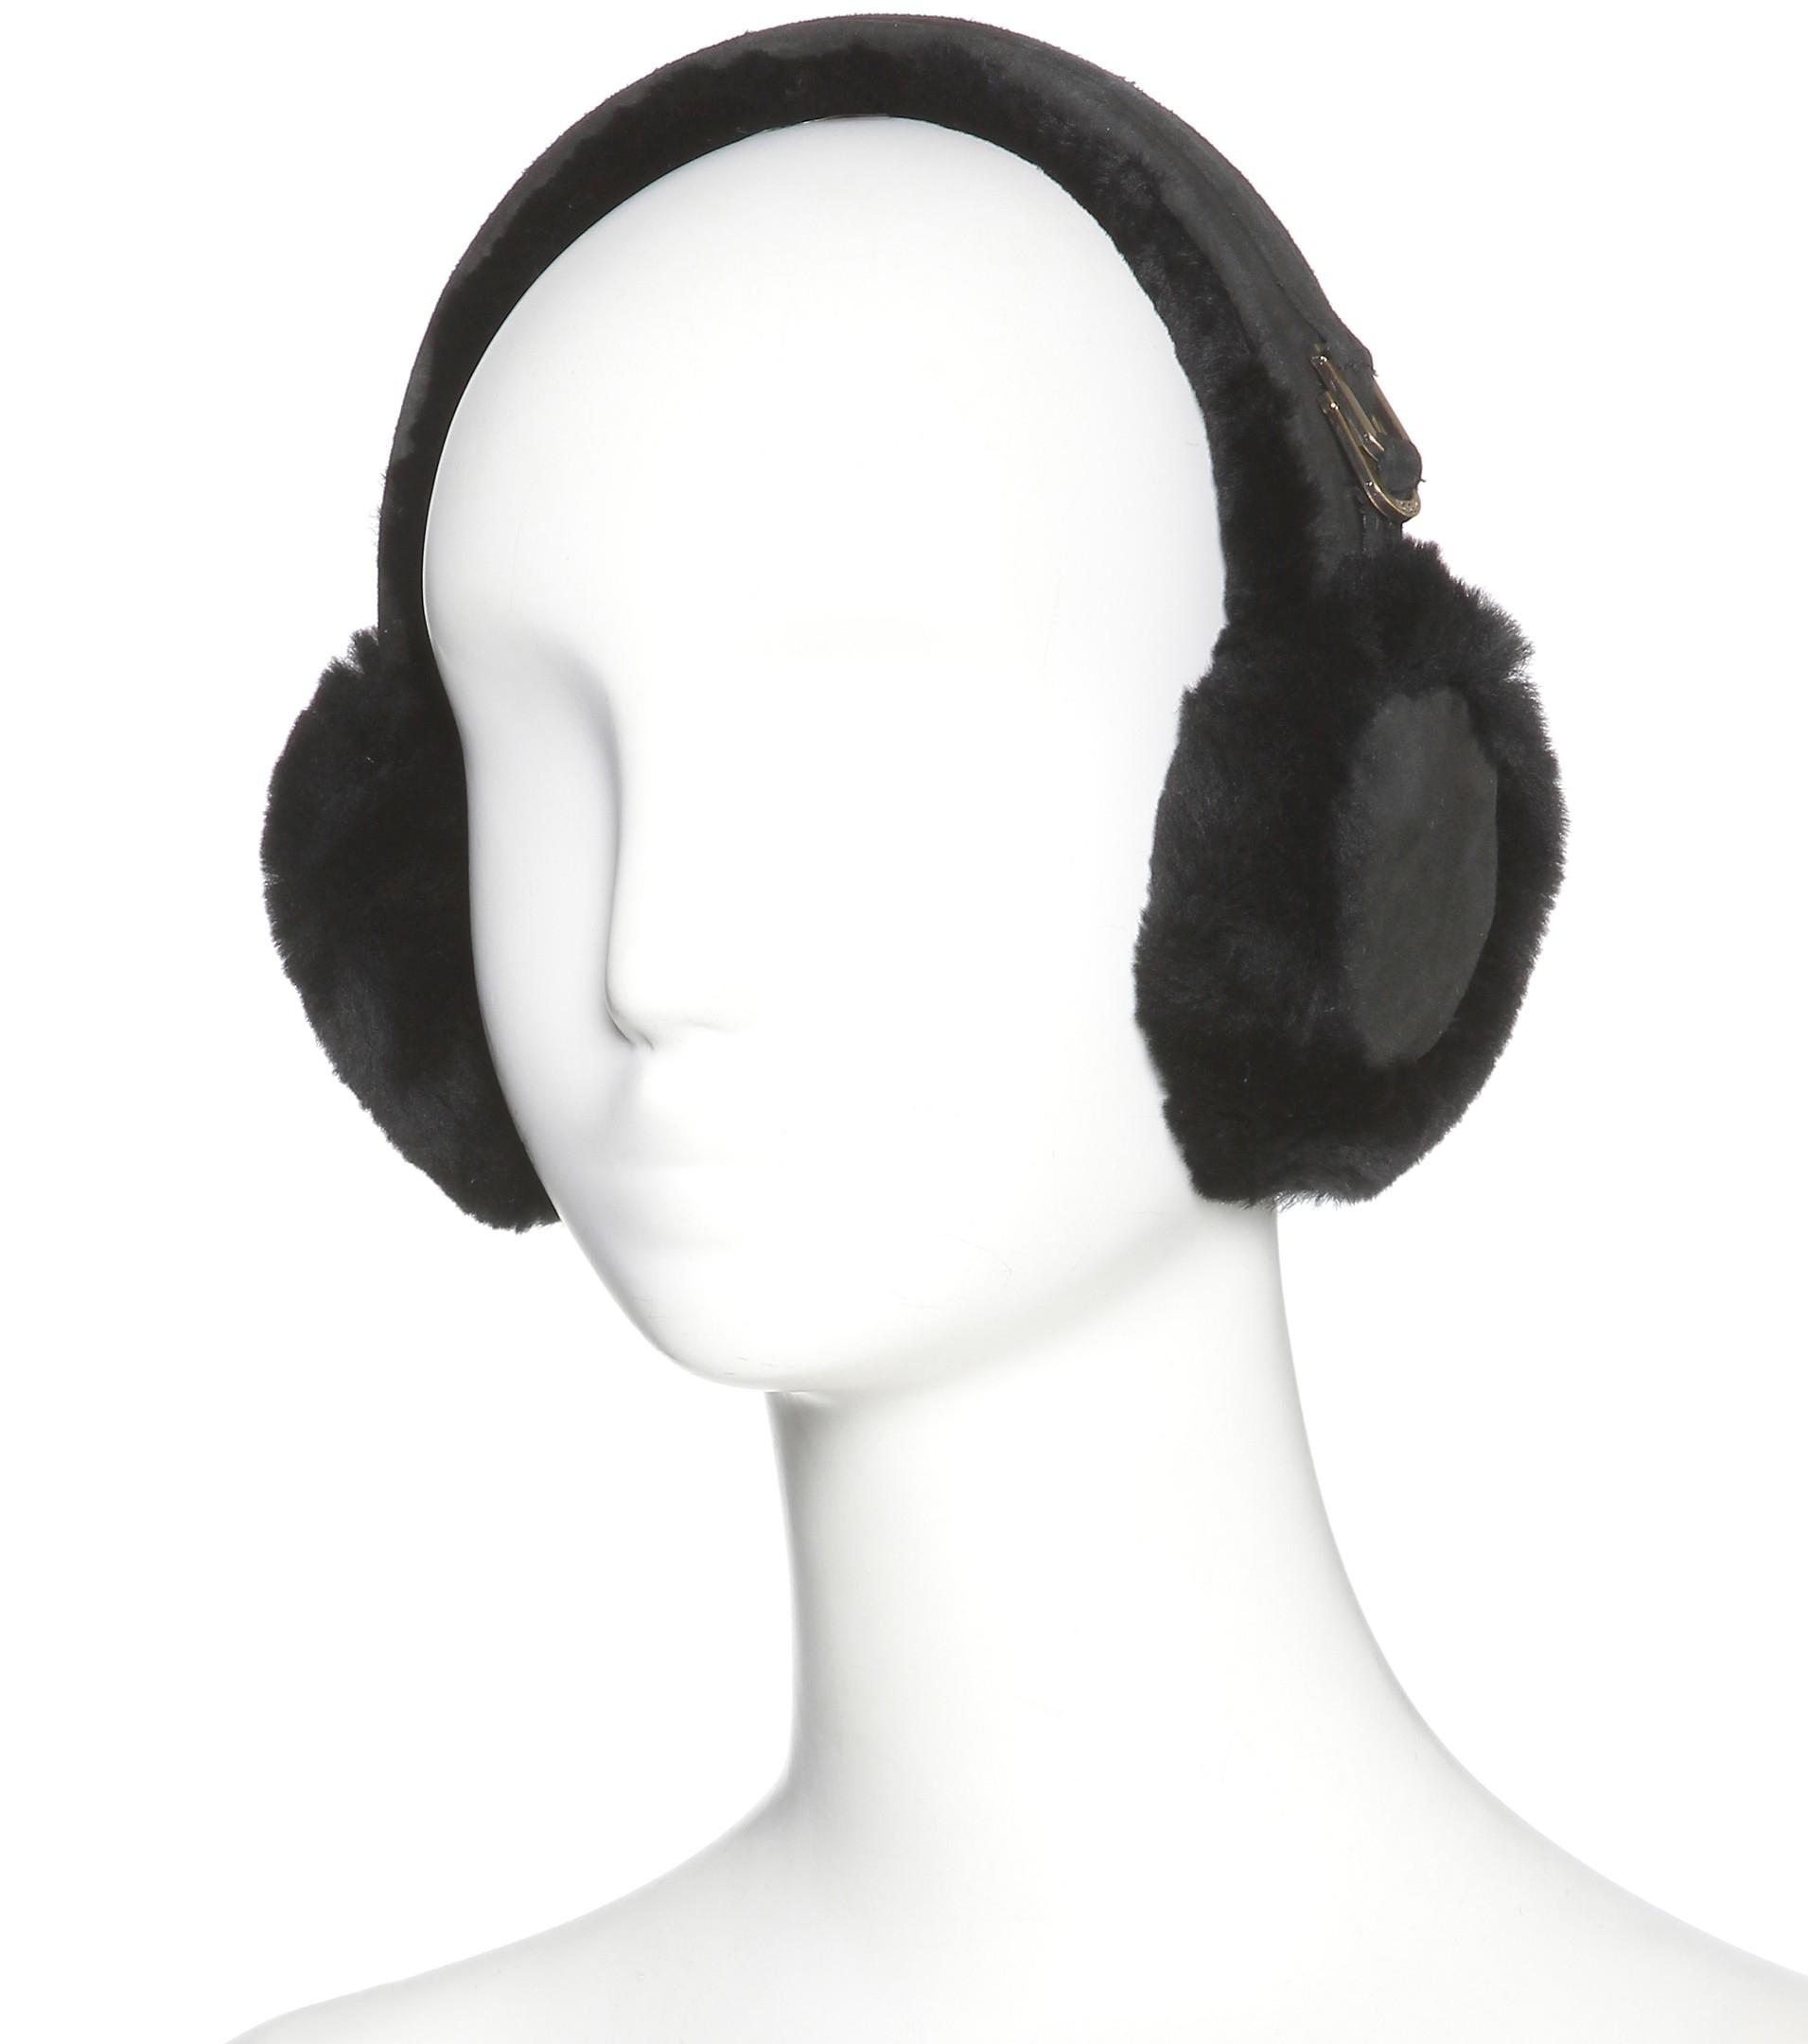 814daad7985 UGG Black Double U Shearling Earmuffs